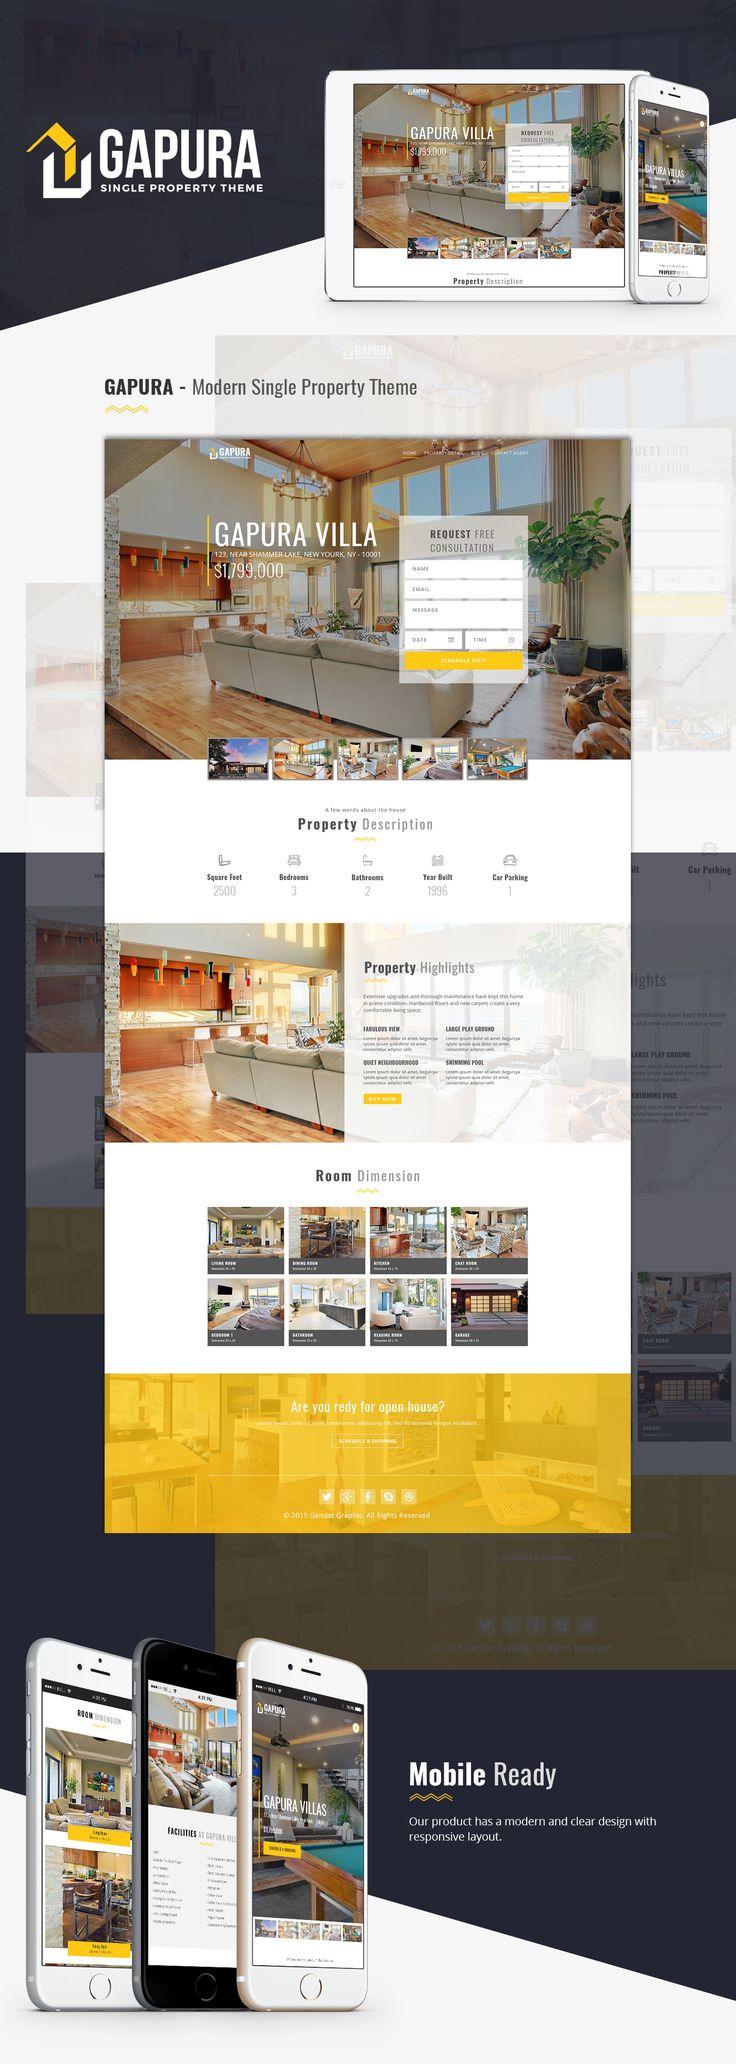 Gapura - Single Property Theme on Behance